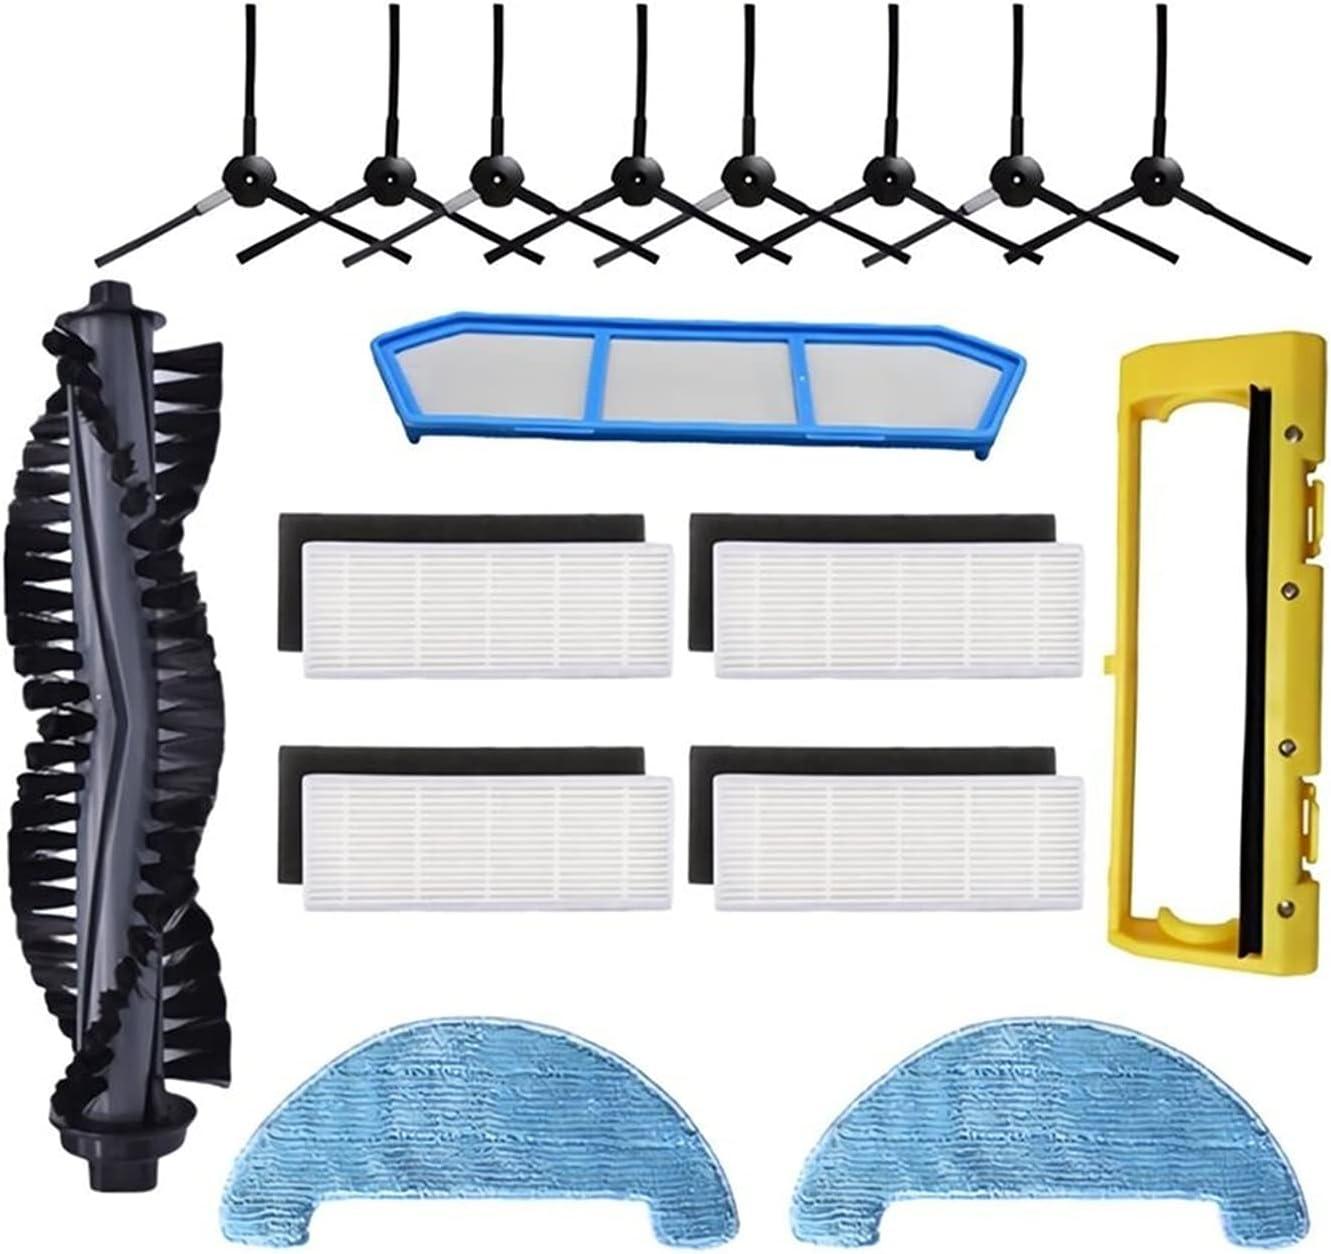 zhangjinlian Import quality assurance Main Roller Brush Mop Filter Polaris Kit Fit for PV